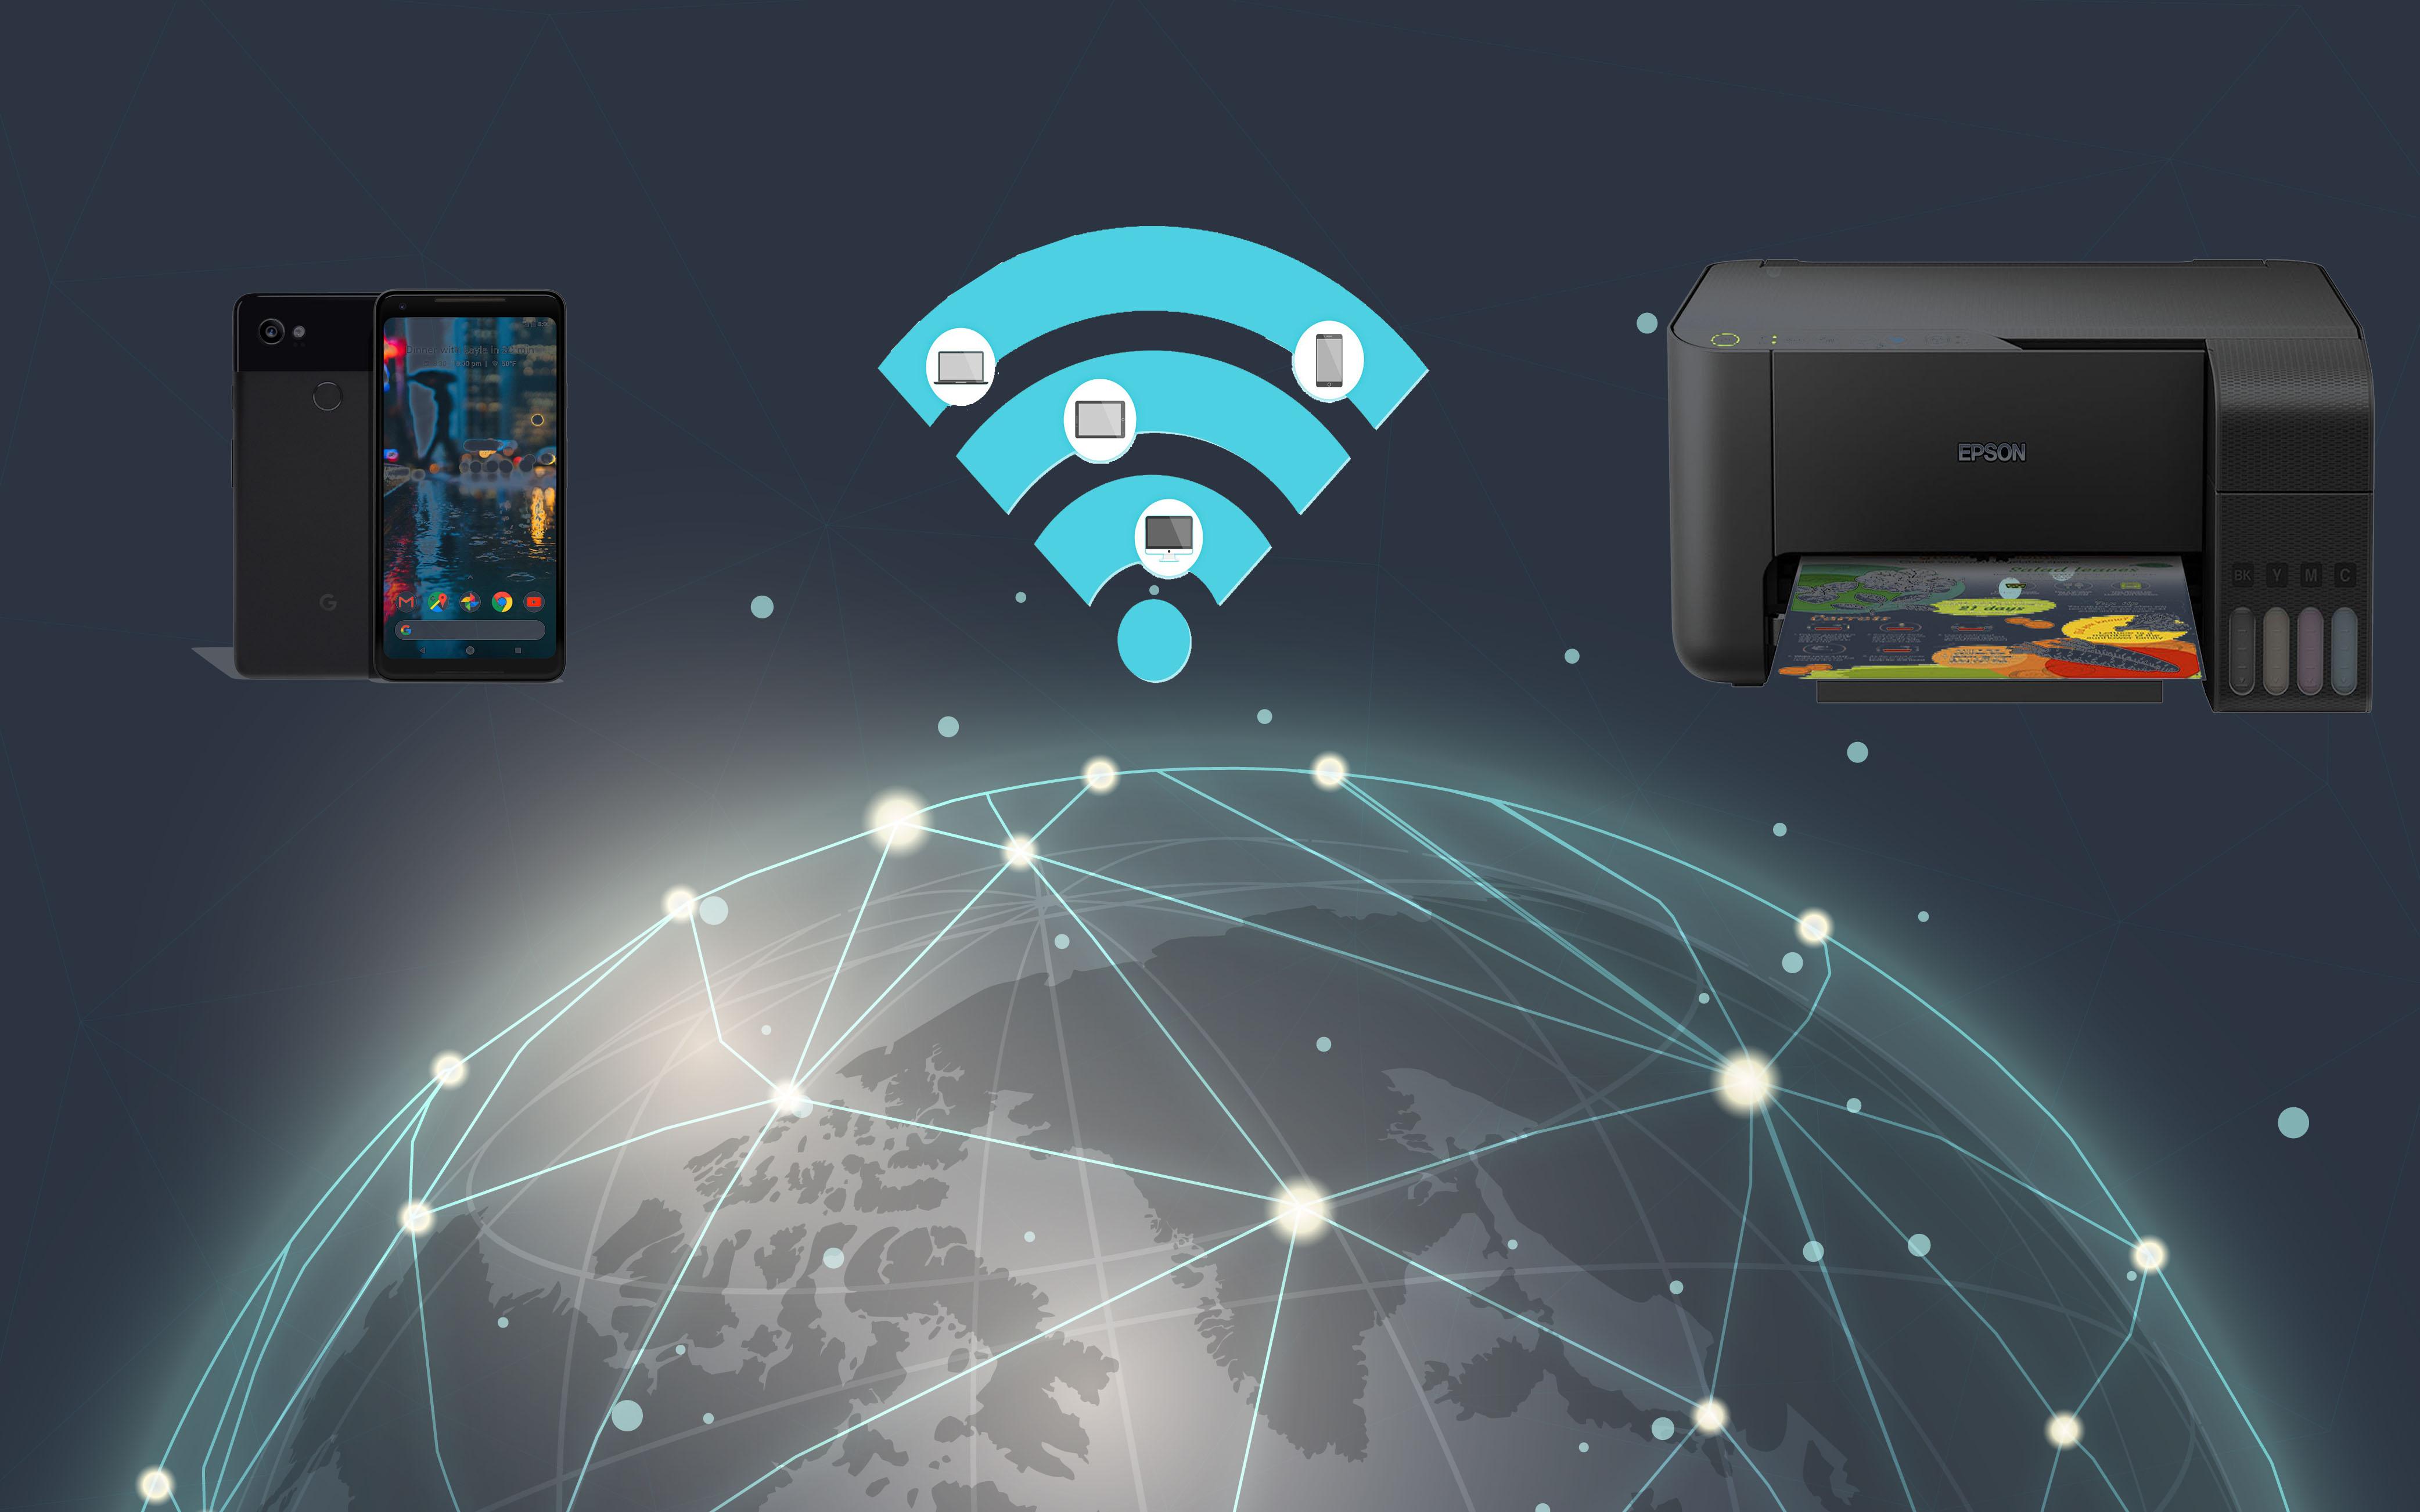 Cara Setting WiFi Printer Epson L3150 | Manxigroup com